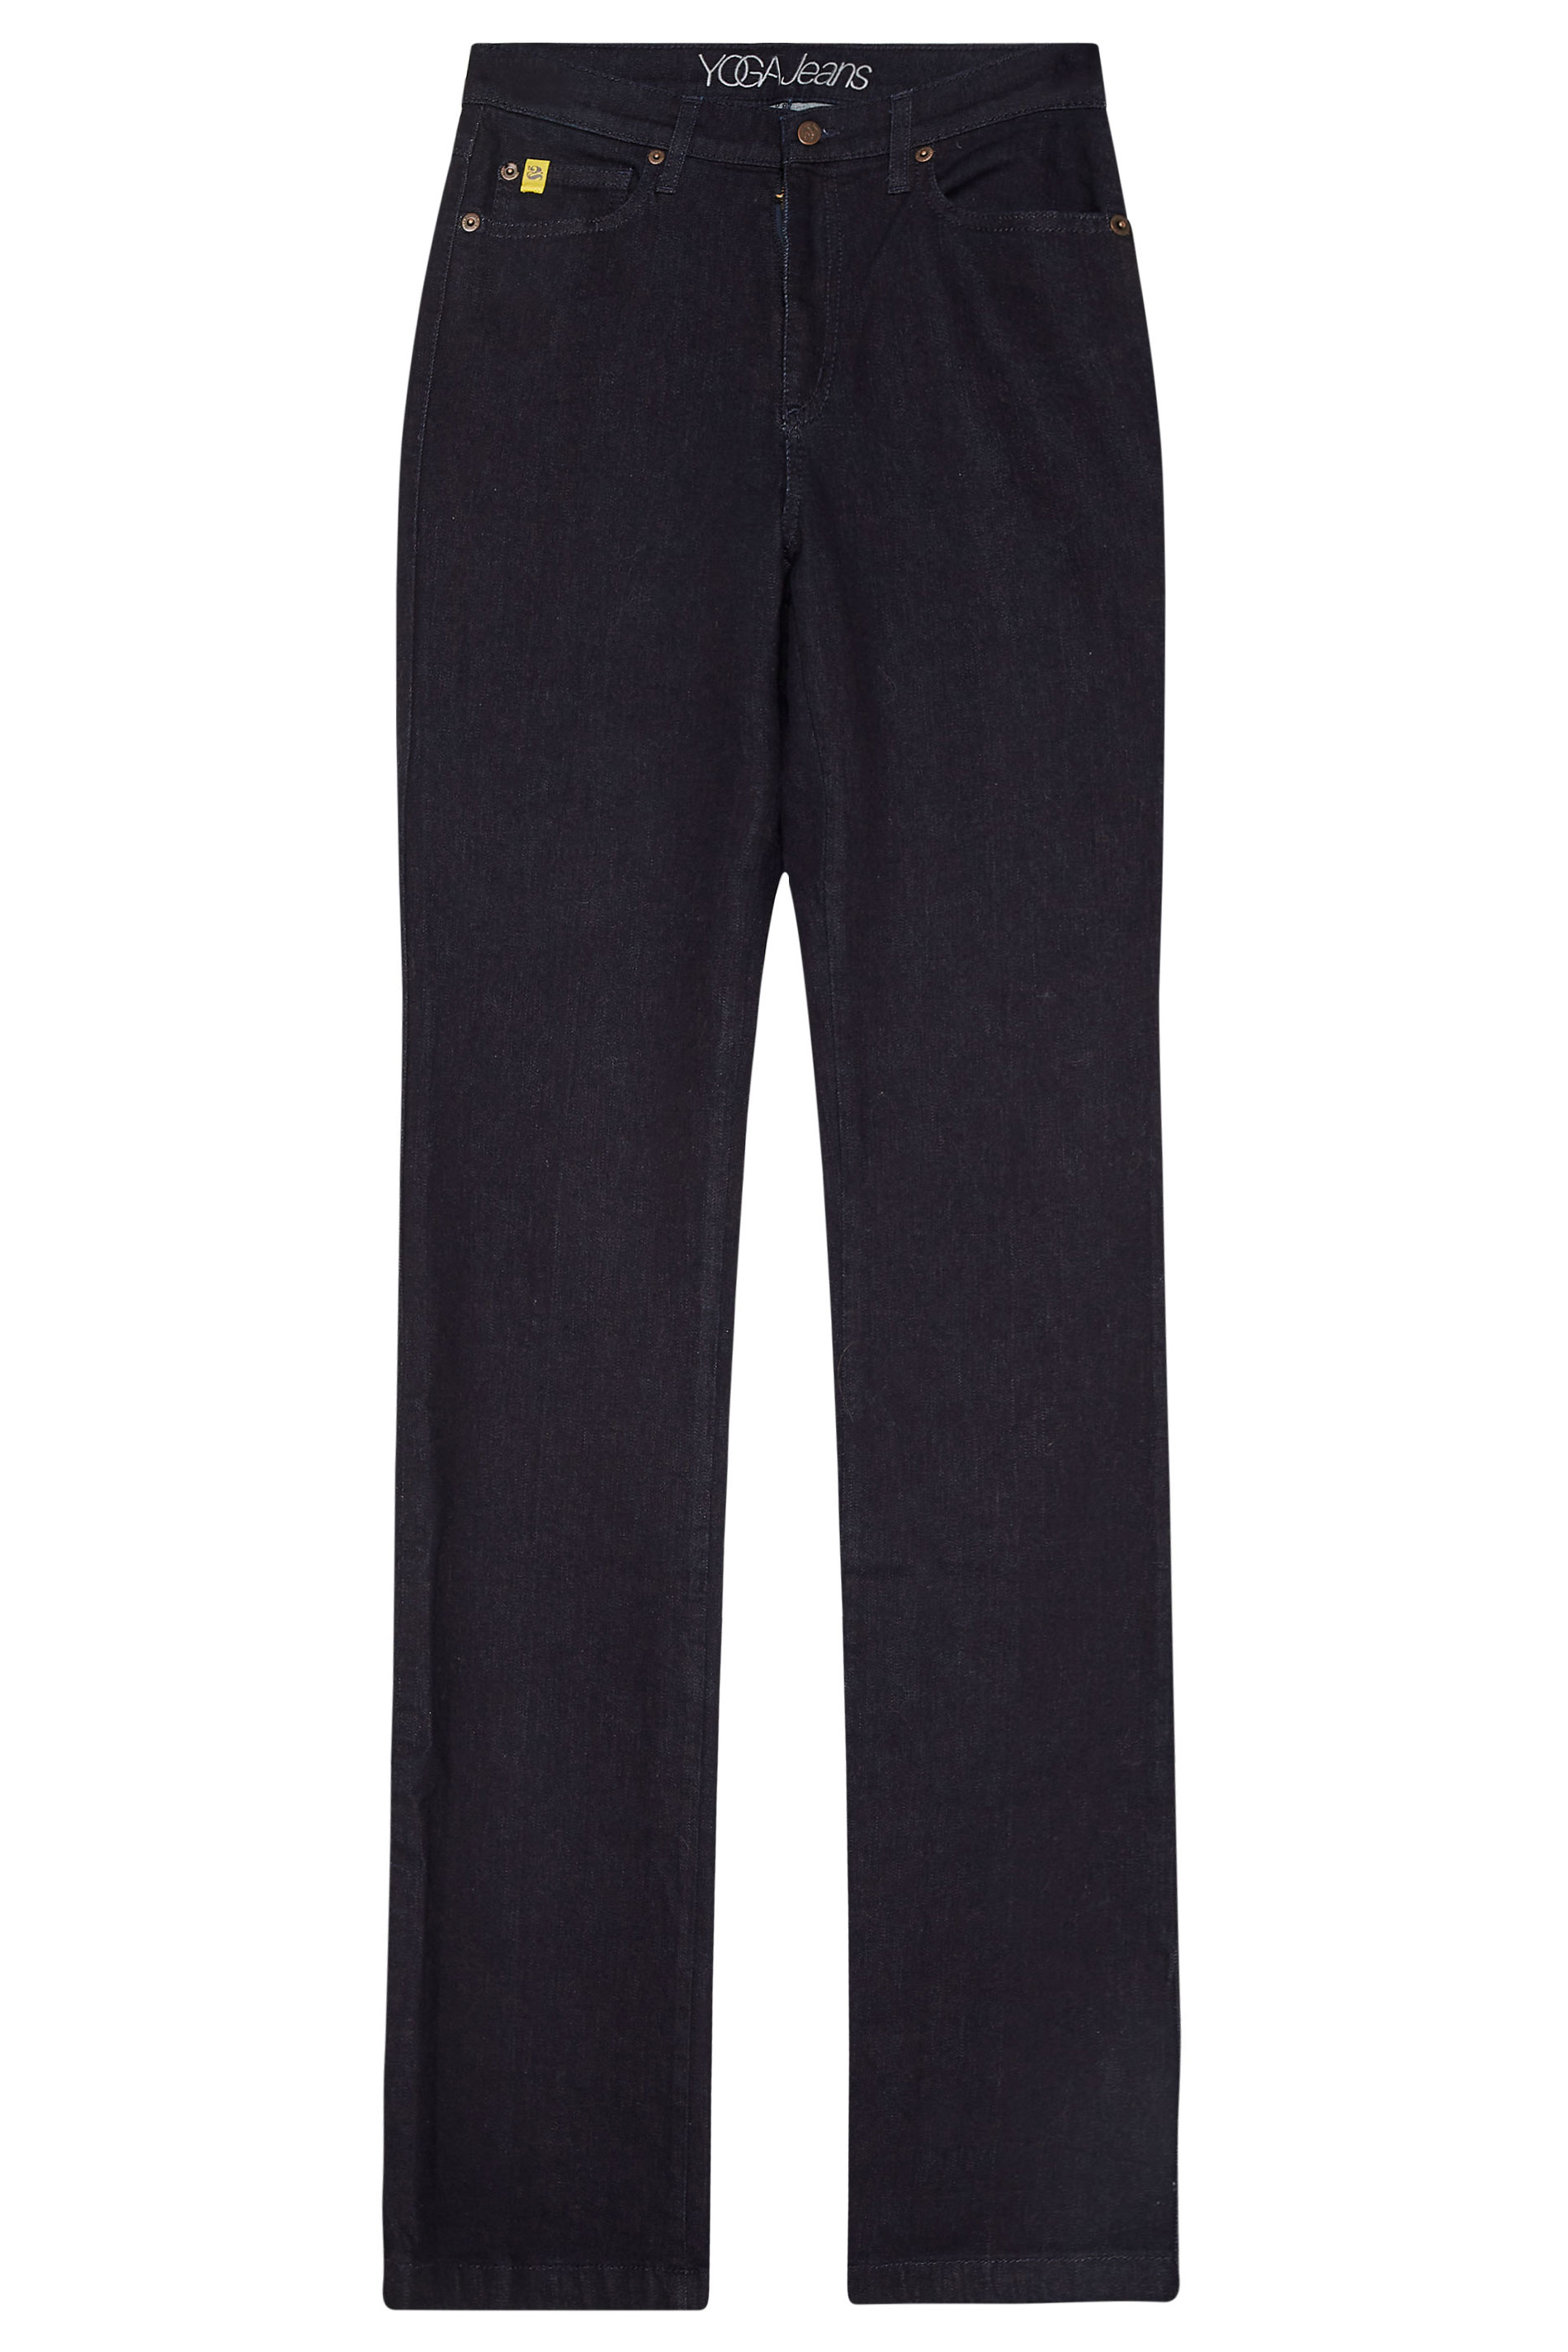 YOGA JEANS Dark Denim Shaper Skinny Jeans